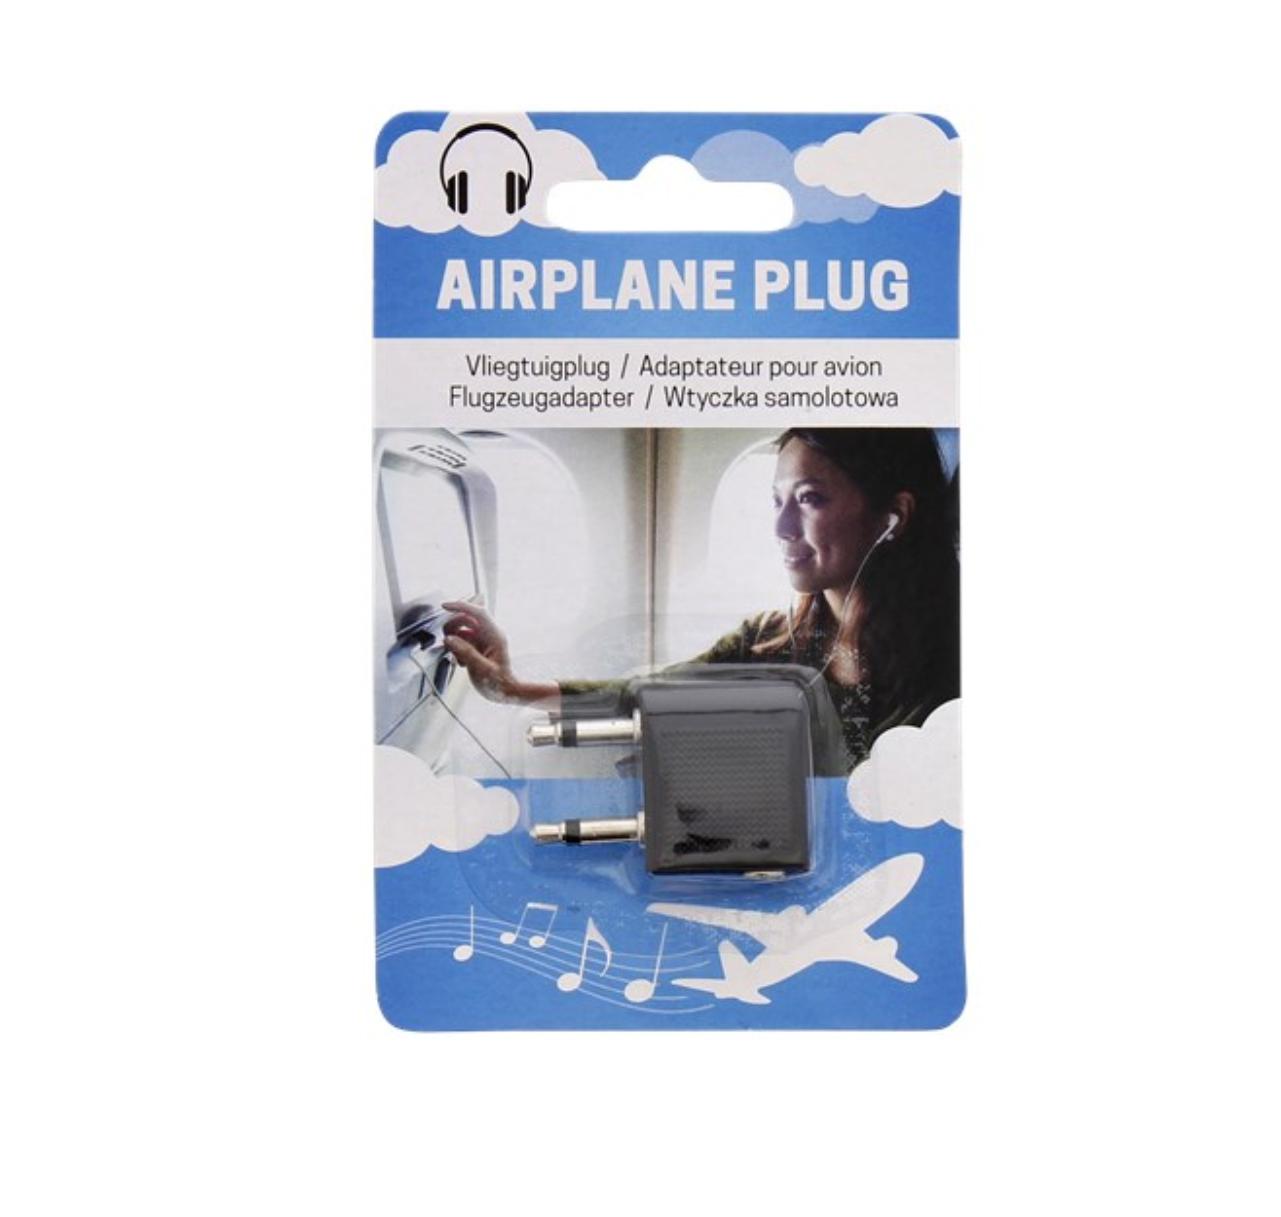 AIRPLANE PLUG FOR HEADPHONE TRAVEL ADAPTATOR PRO VOYAGE PRISE ADAPTATEUR ECOUTEUR COMASOUND KARTEL CSK ONLINE